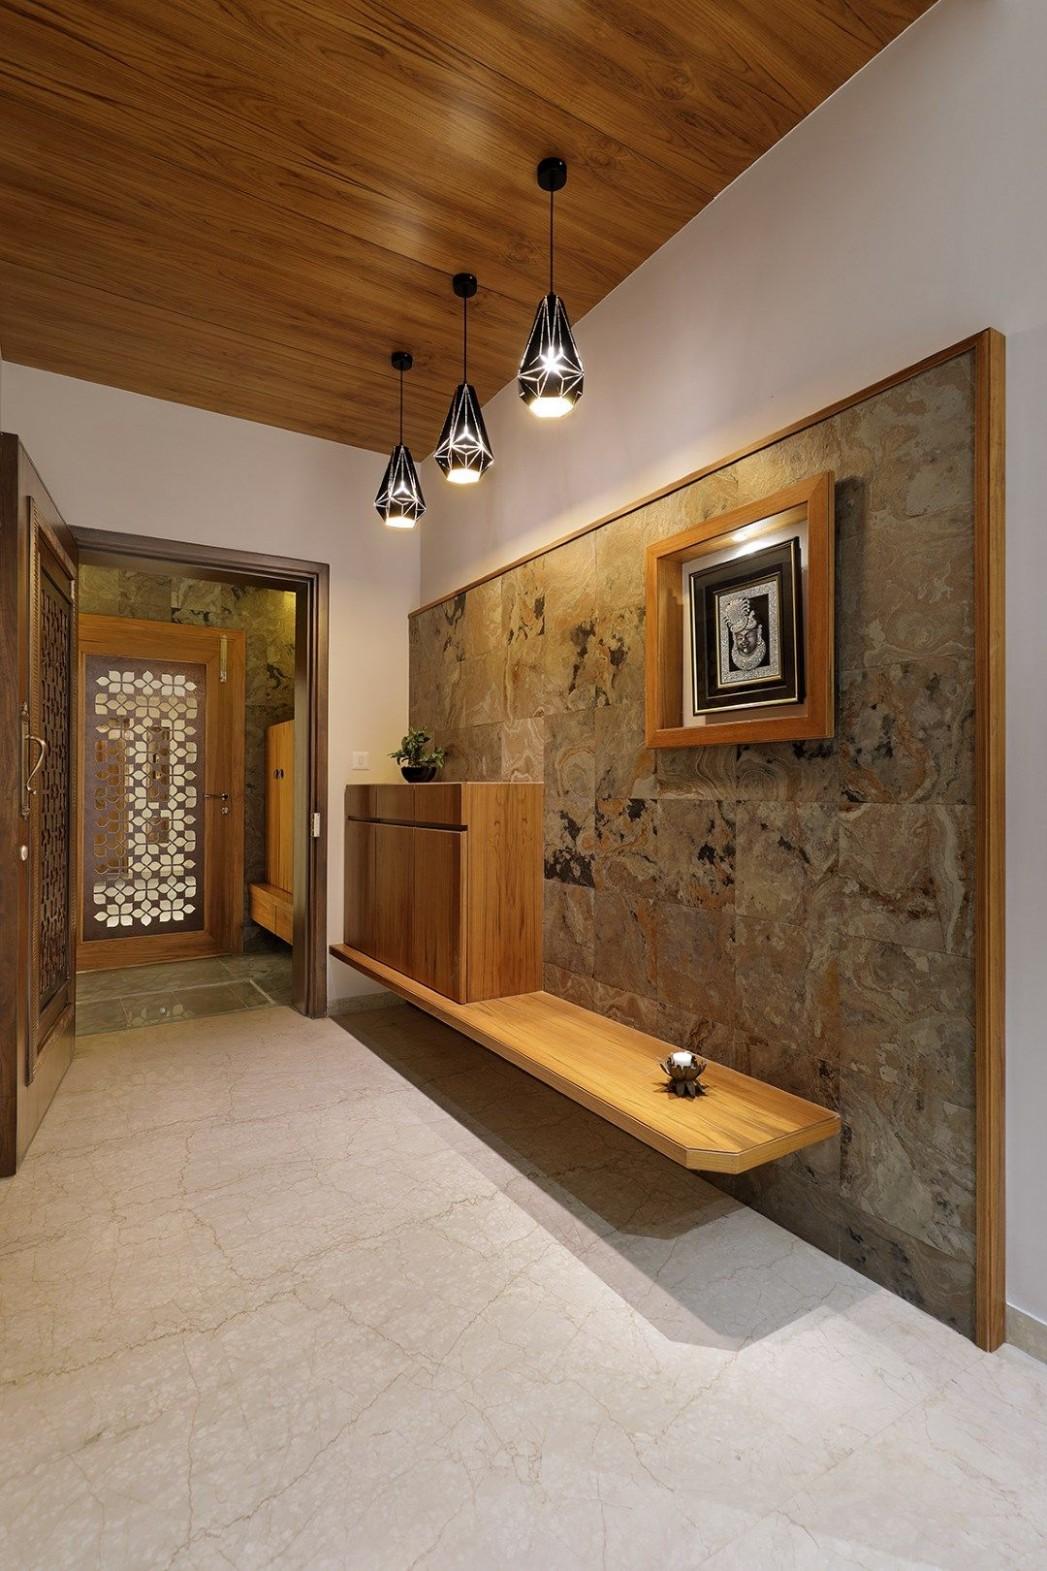 Floral Pattern Inspires Apartment Interiors  Studio 10 - The  - Apartment Entrance Design Ideas